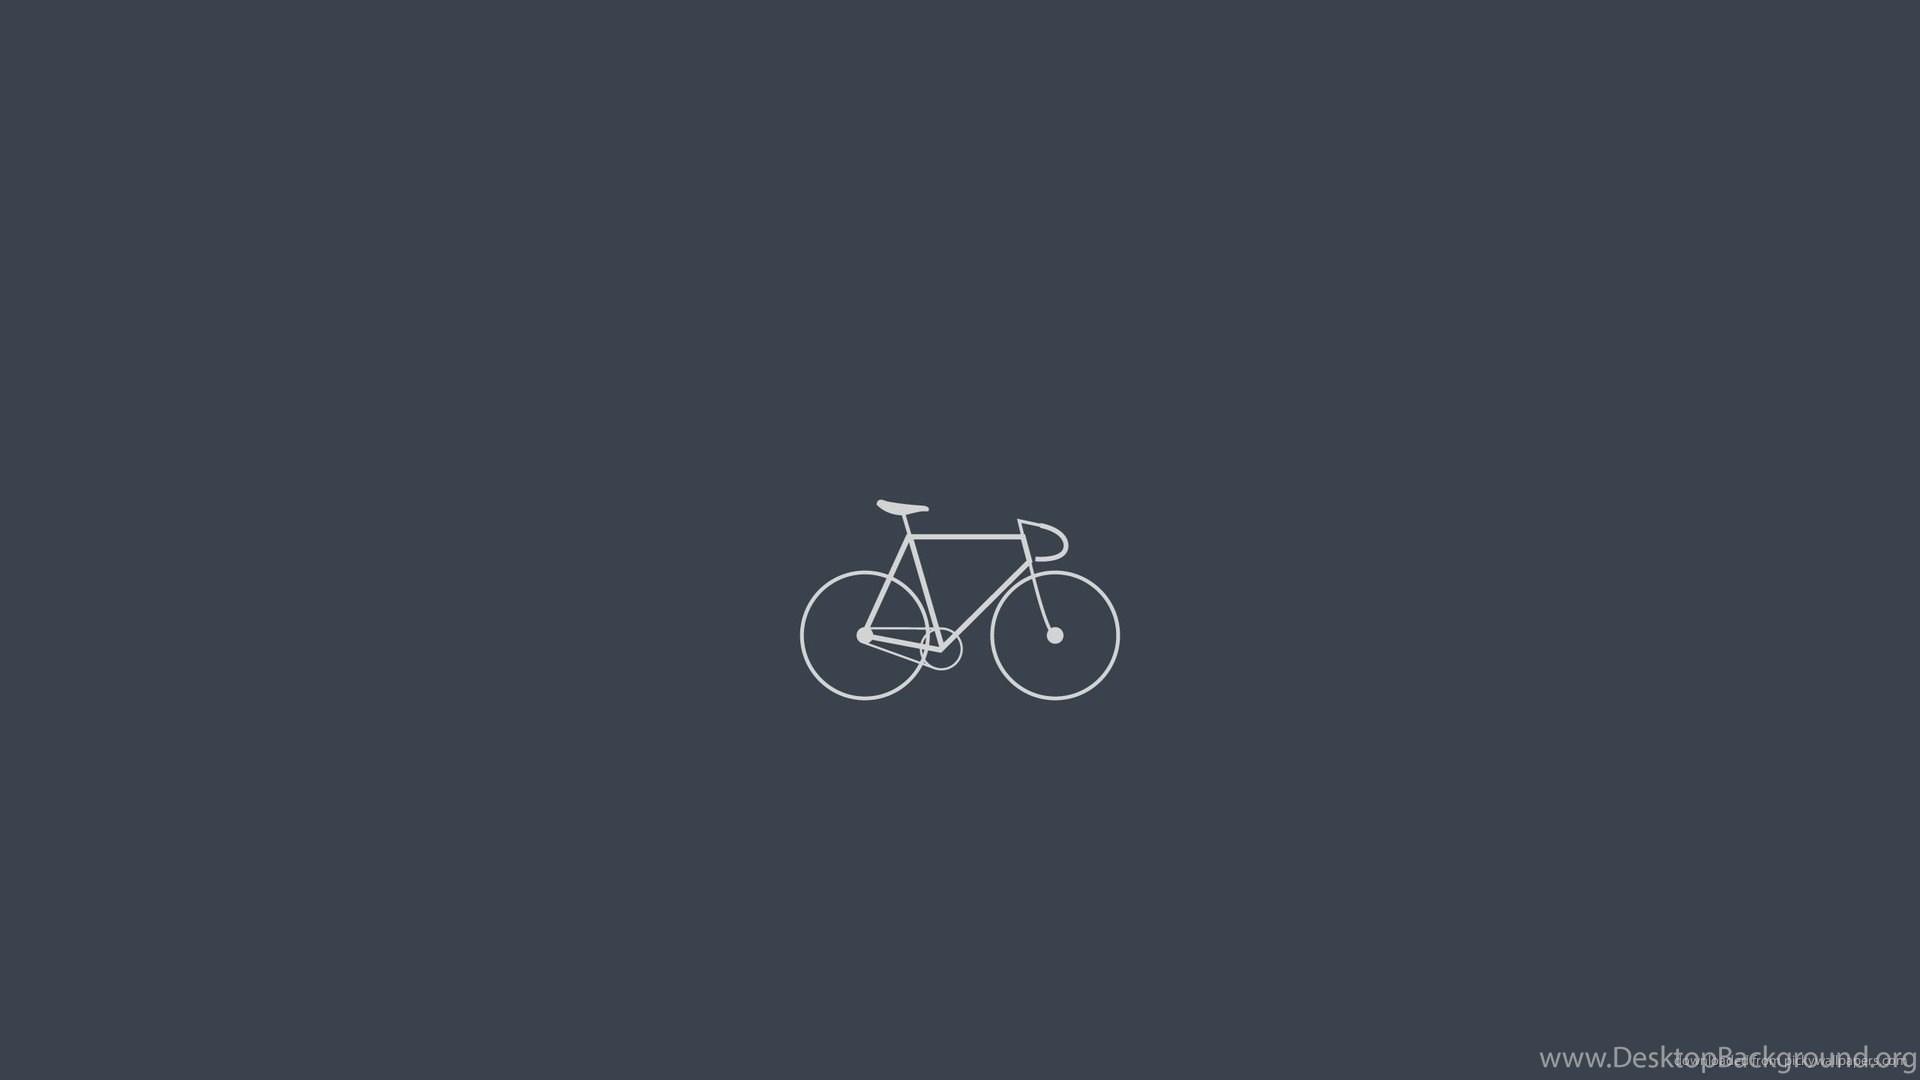 Download 1920x1080 Minimalistci Fixed Gear Bike Wallpapers Desktop